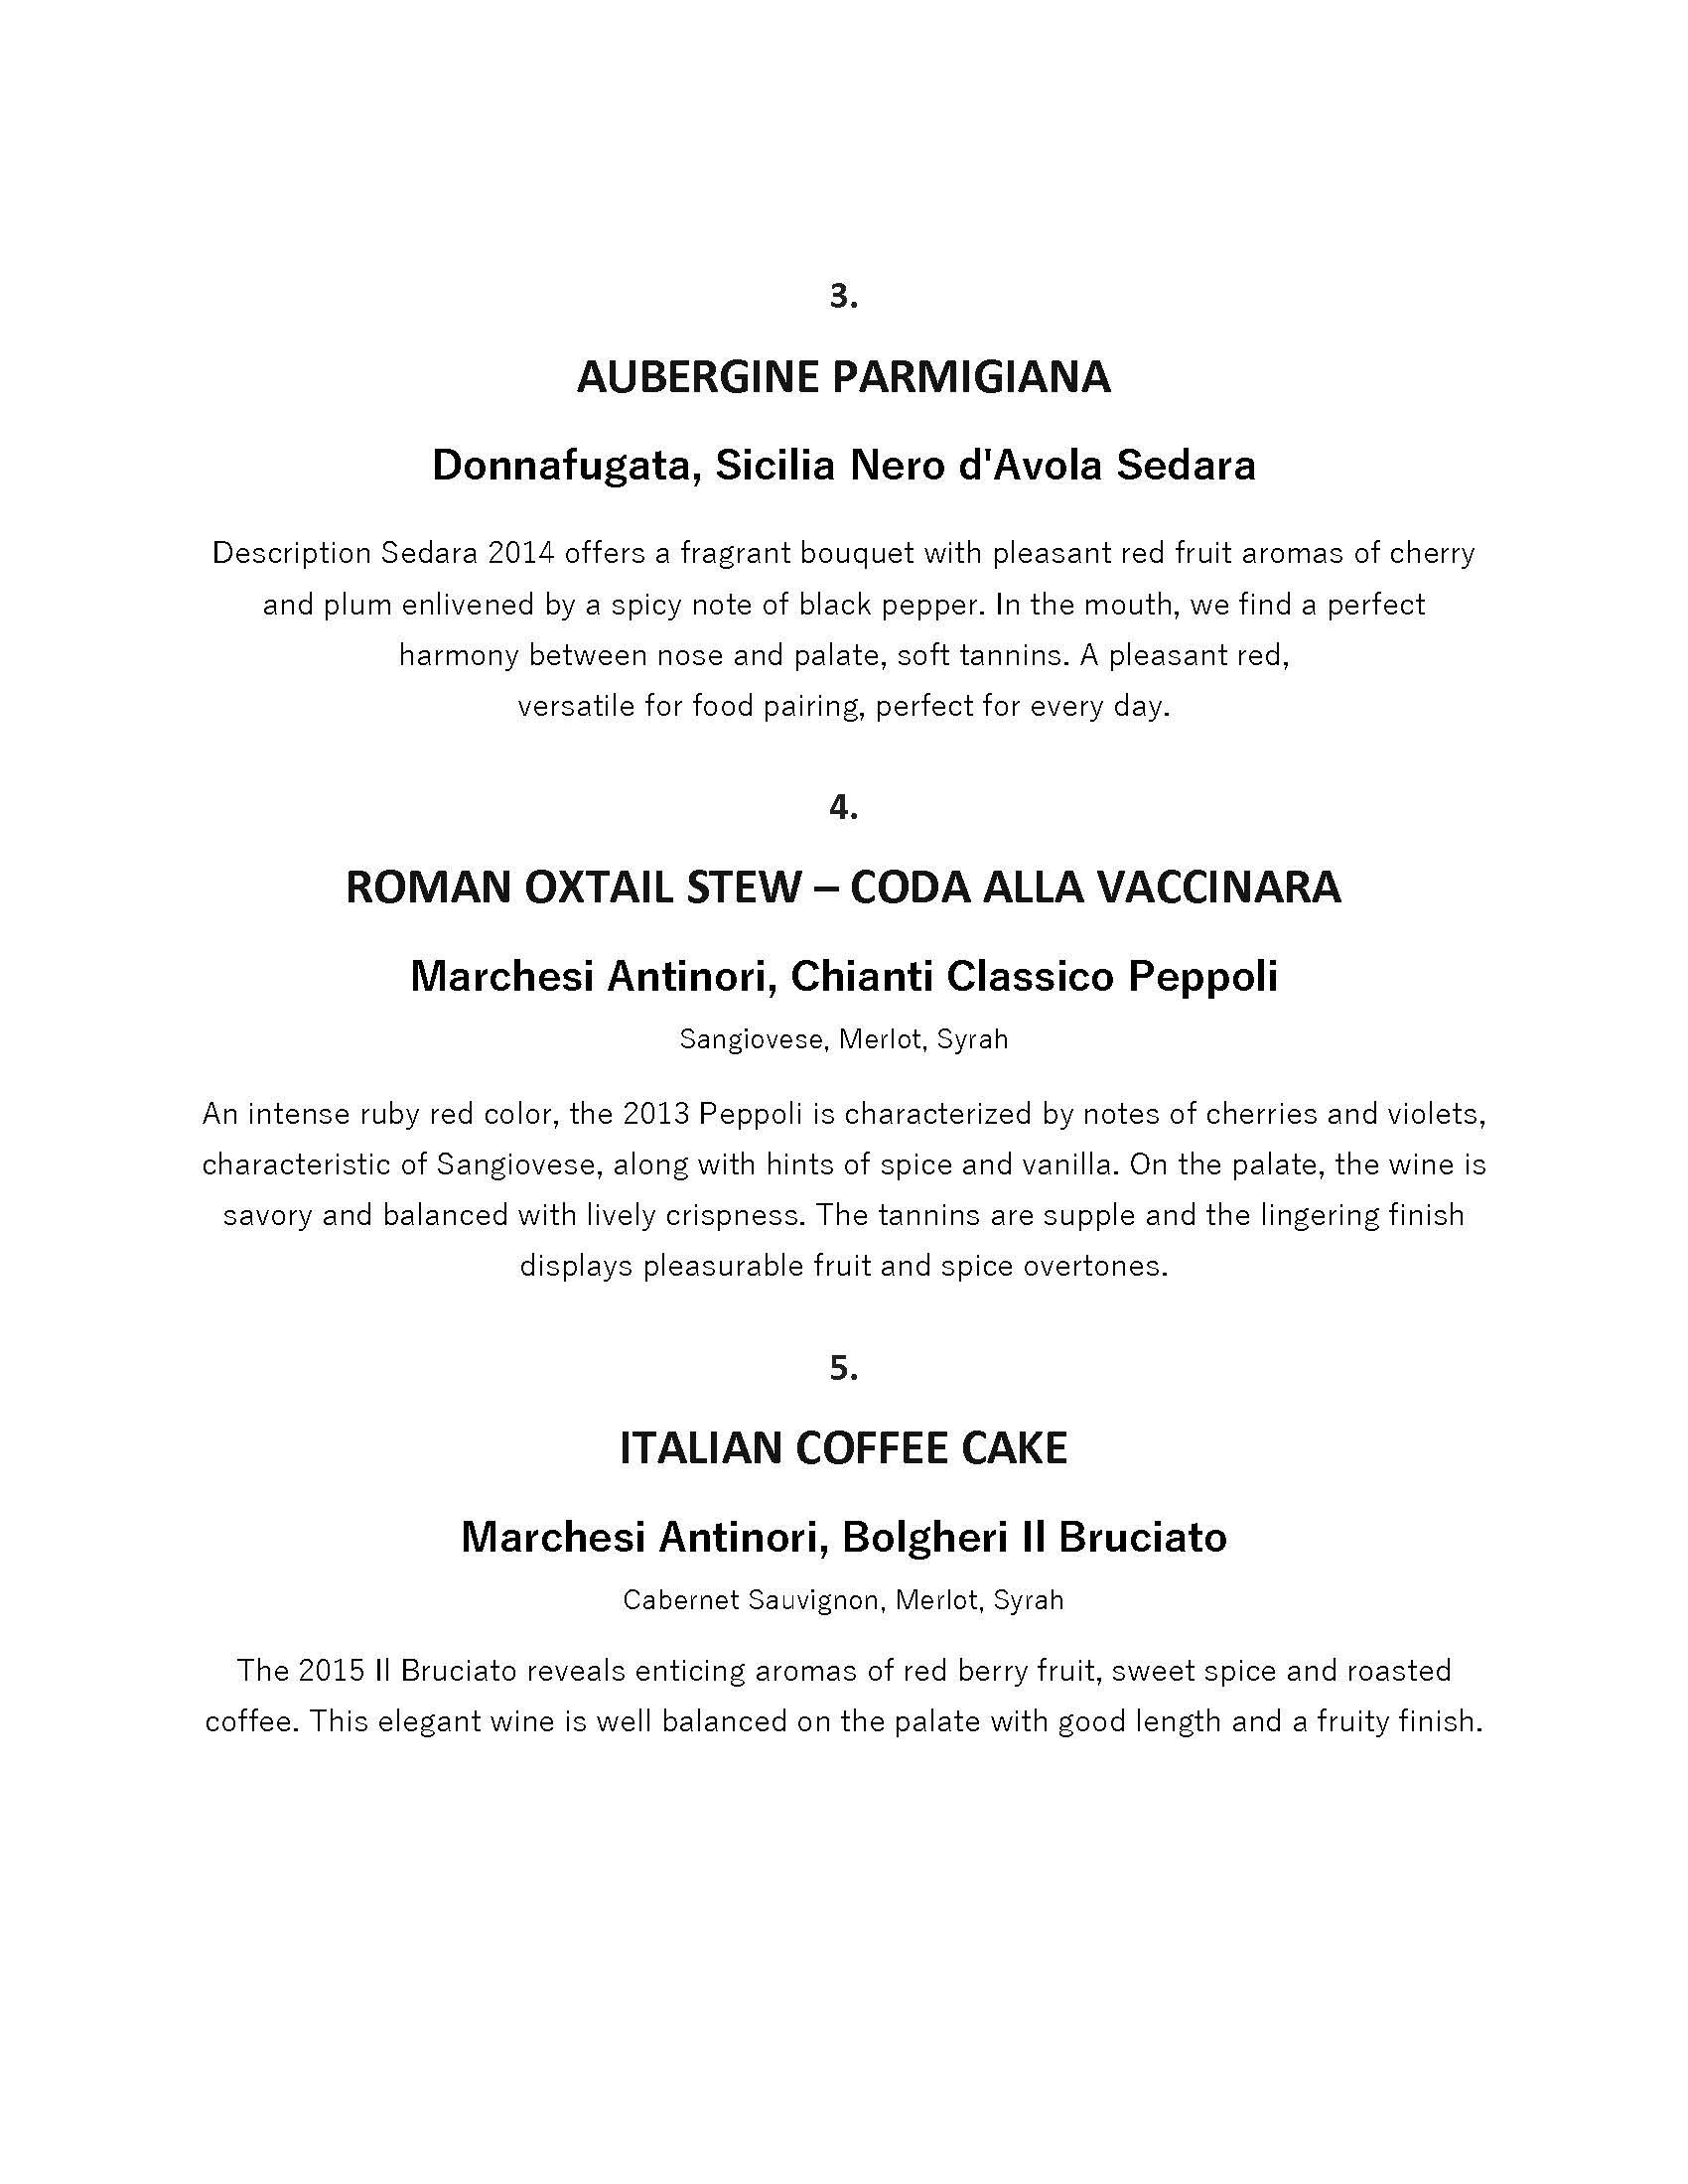 Italian Wine dinner-10-04_Page_2.jpg